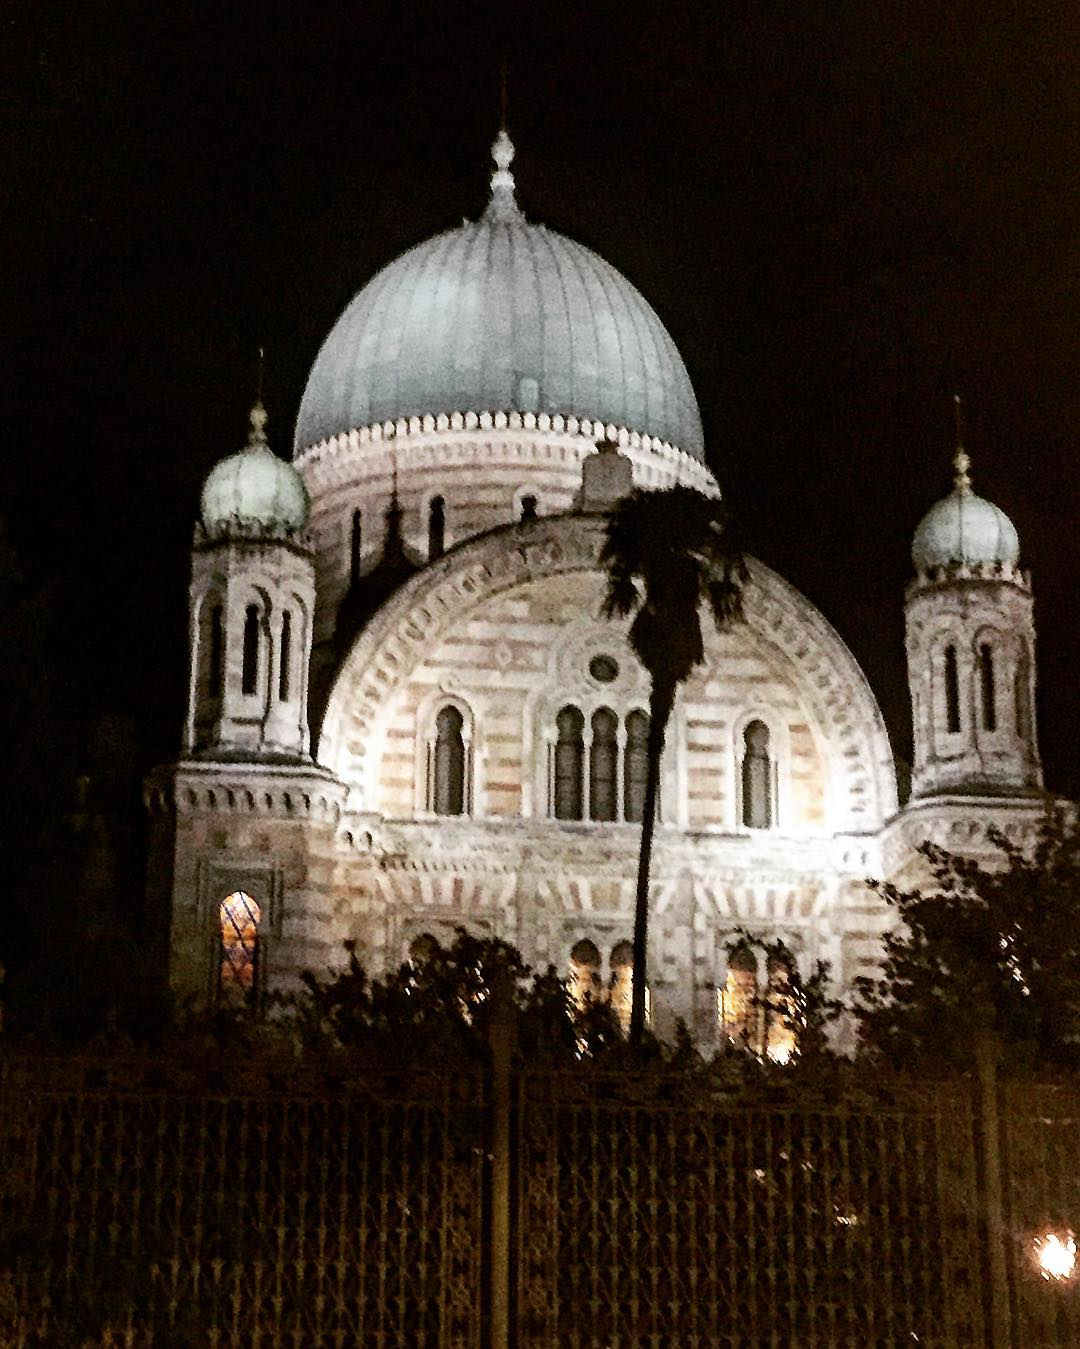 Esotico moresco sinagoga florence firenzefuori santambrogio architecture